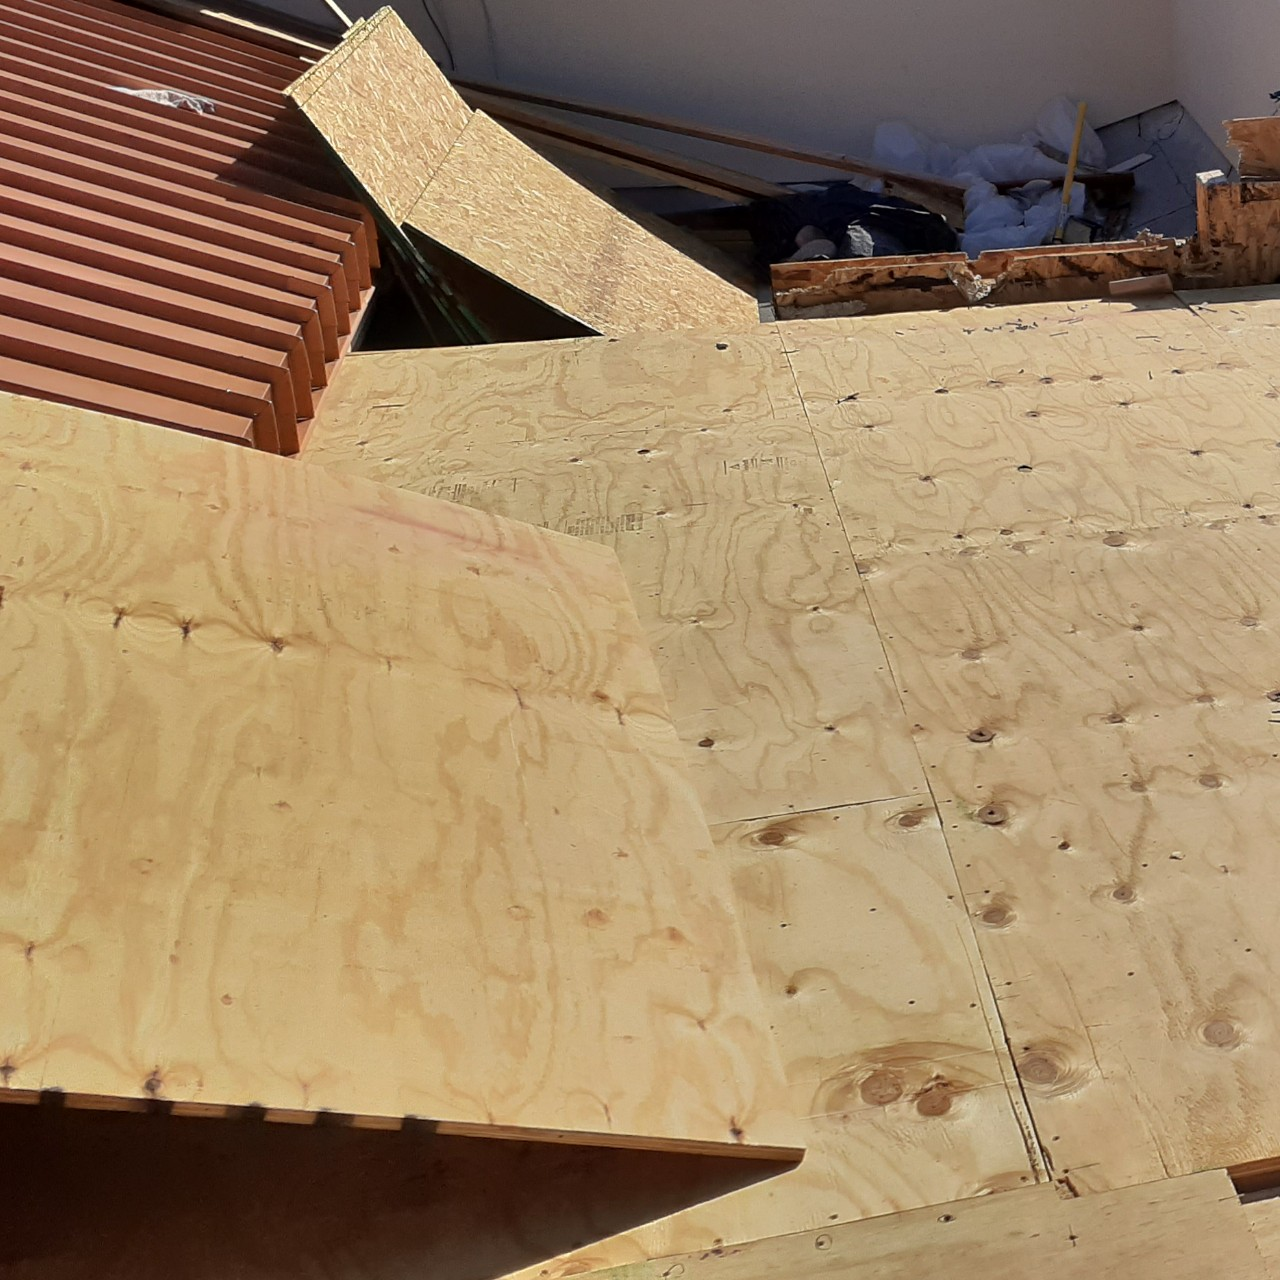 carpentry-wood-framing-second-floor-home-addition--framing-63